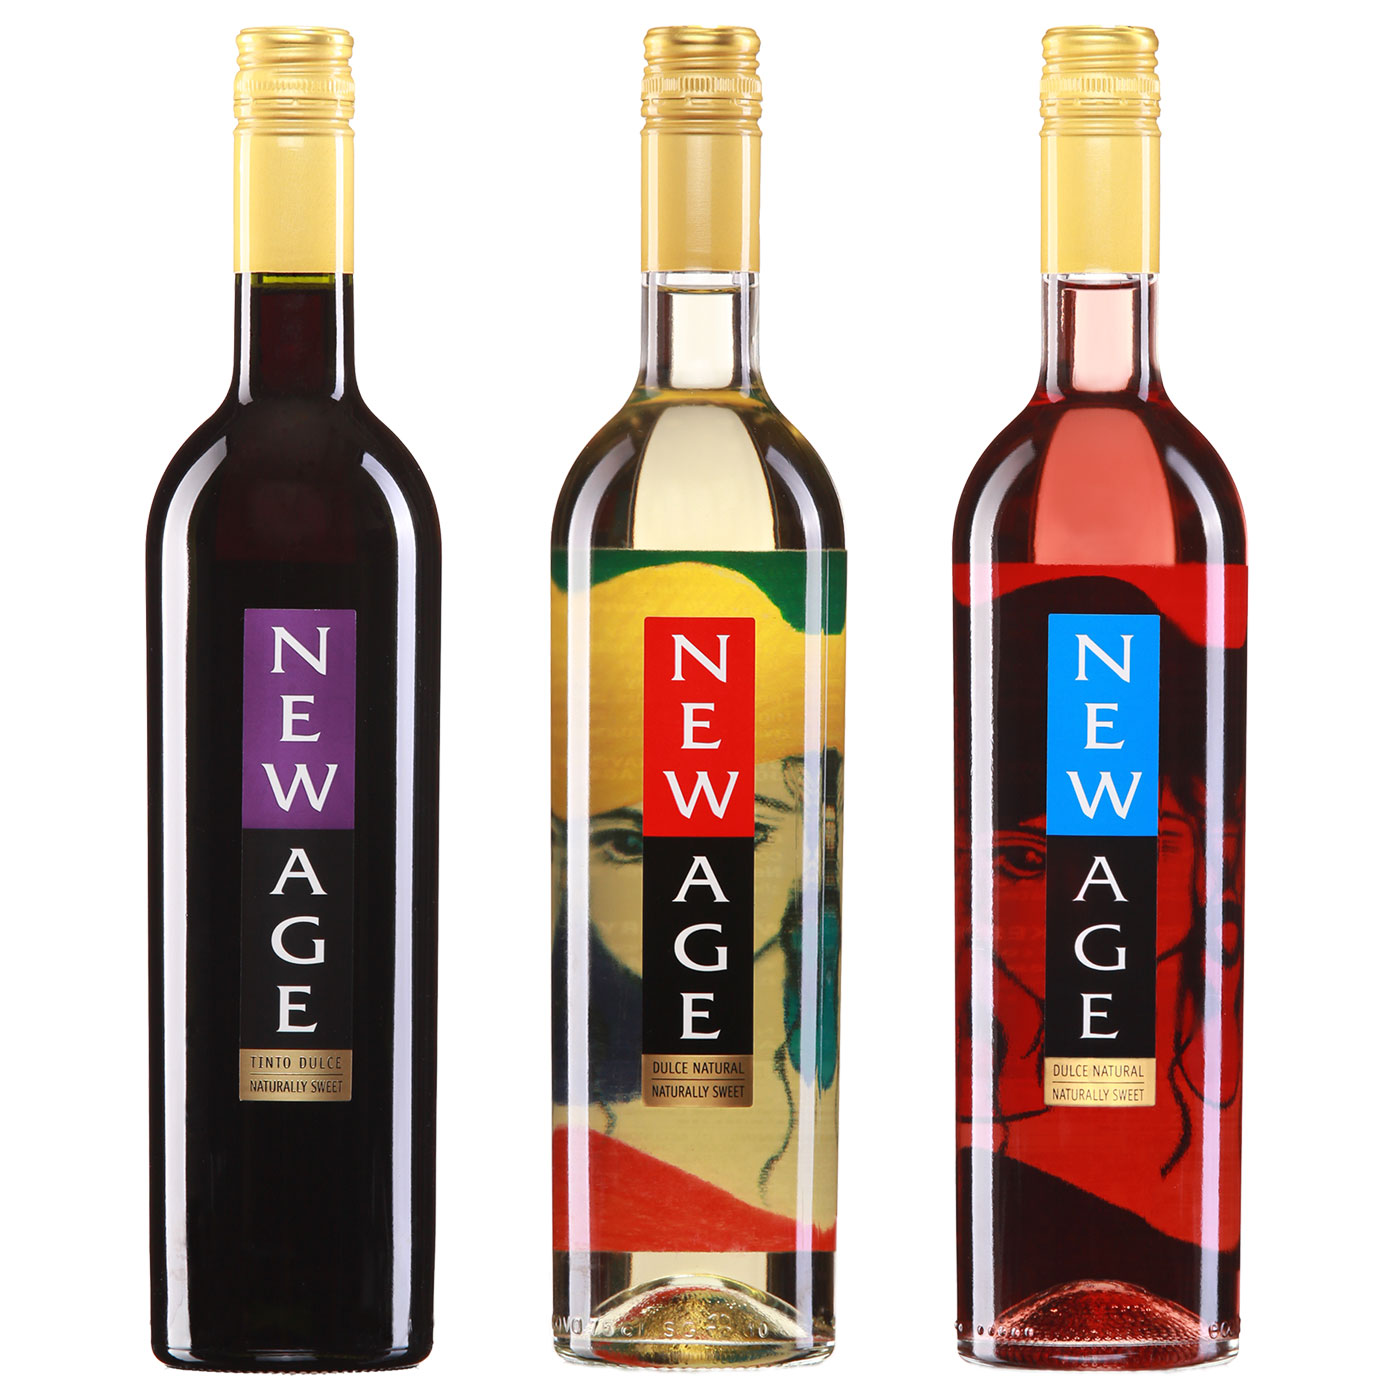 New Age Argentina Wines